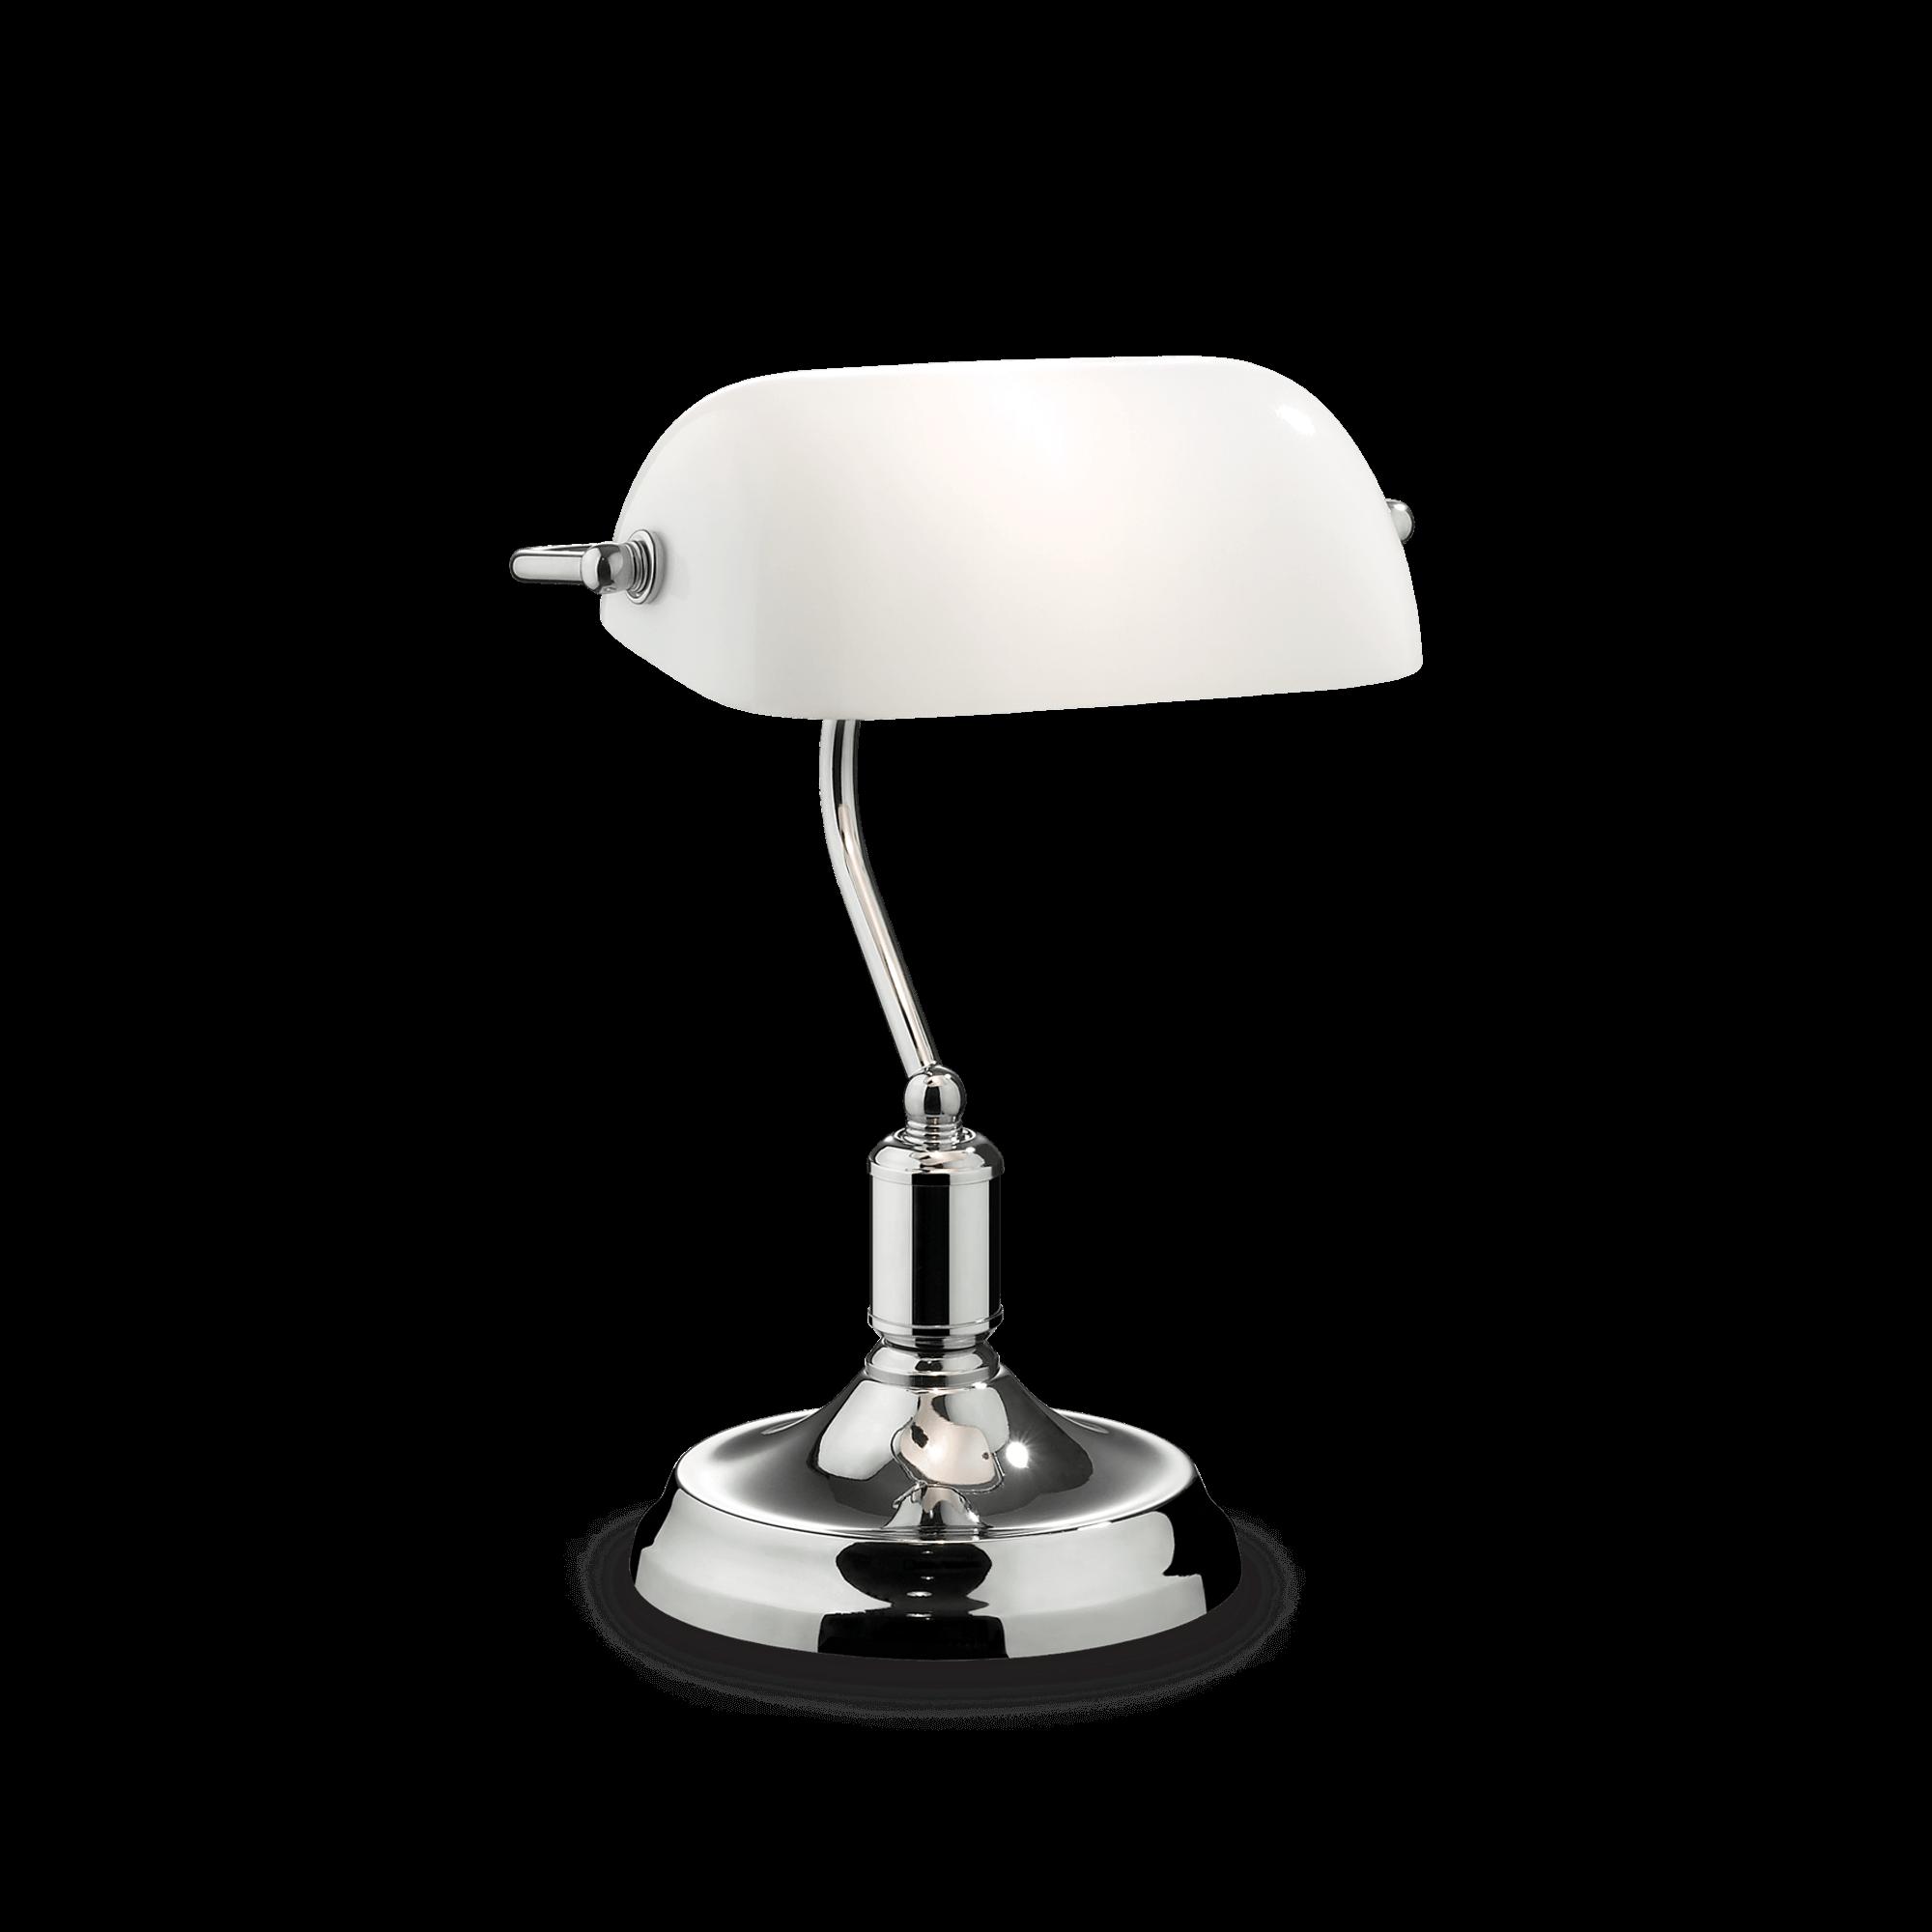 IDEAL LUX LAMPADA DA TAVOLO LAWYER TL1 BIANCO